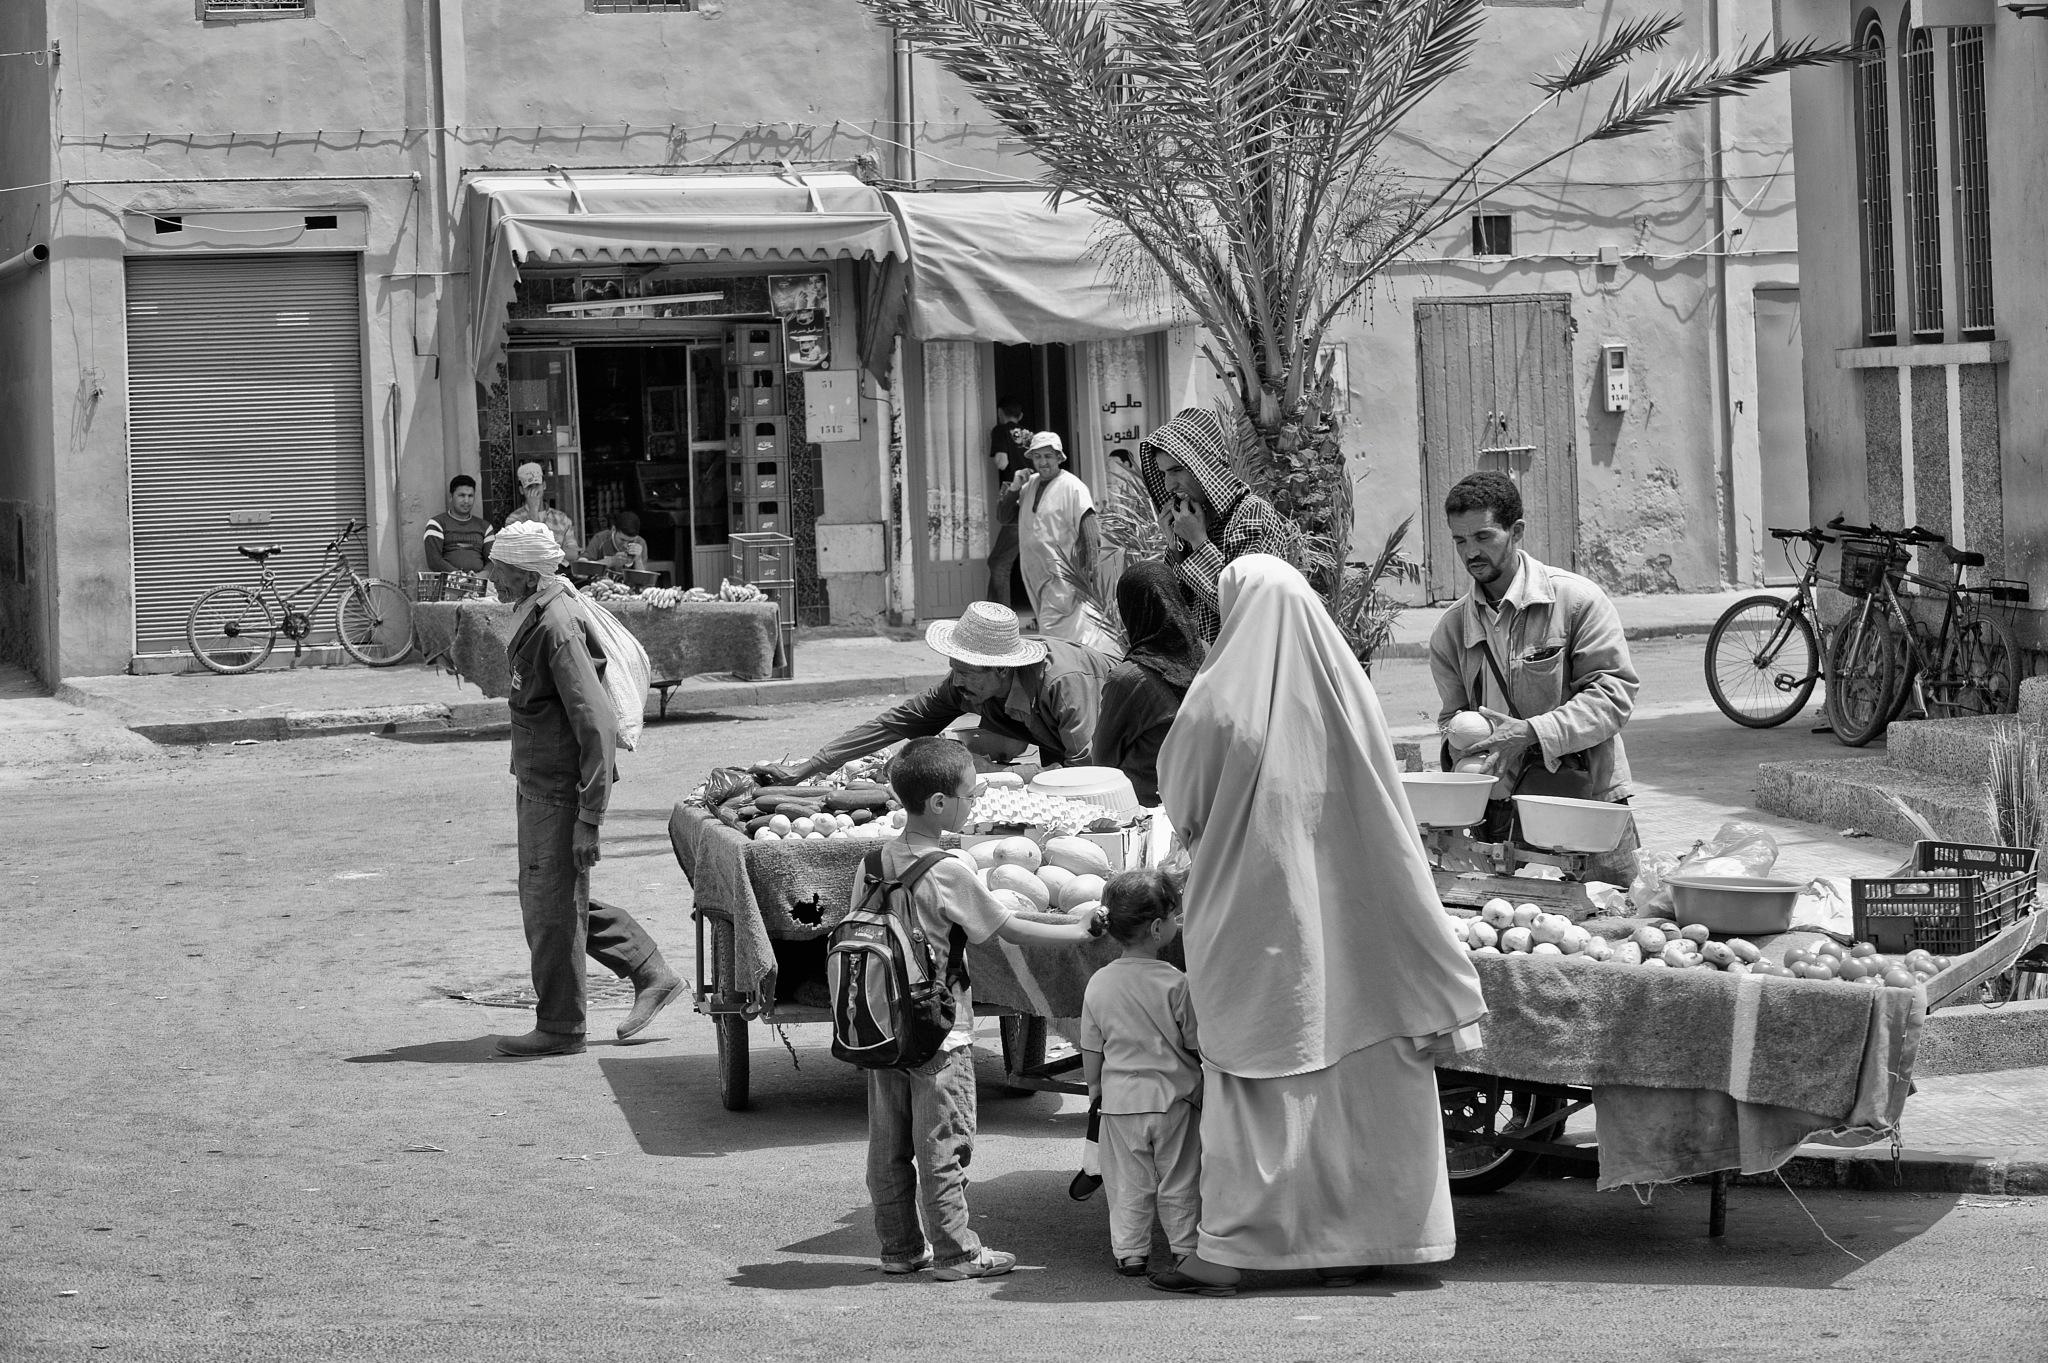 Street, Morocco   9 by desmcmahon5